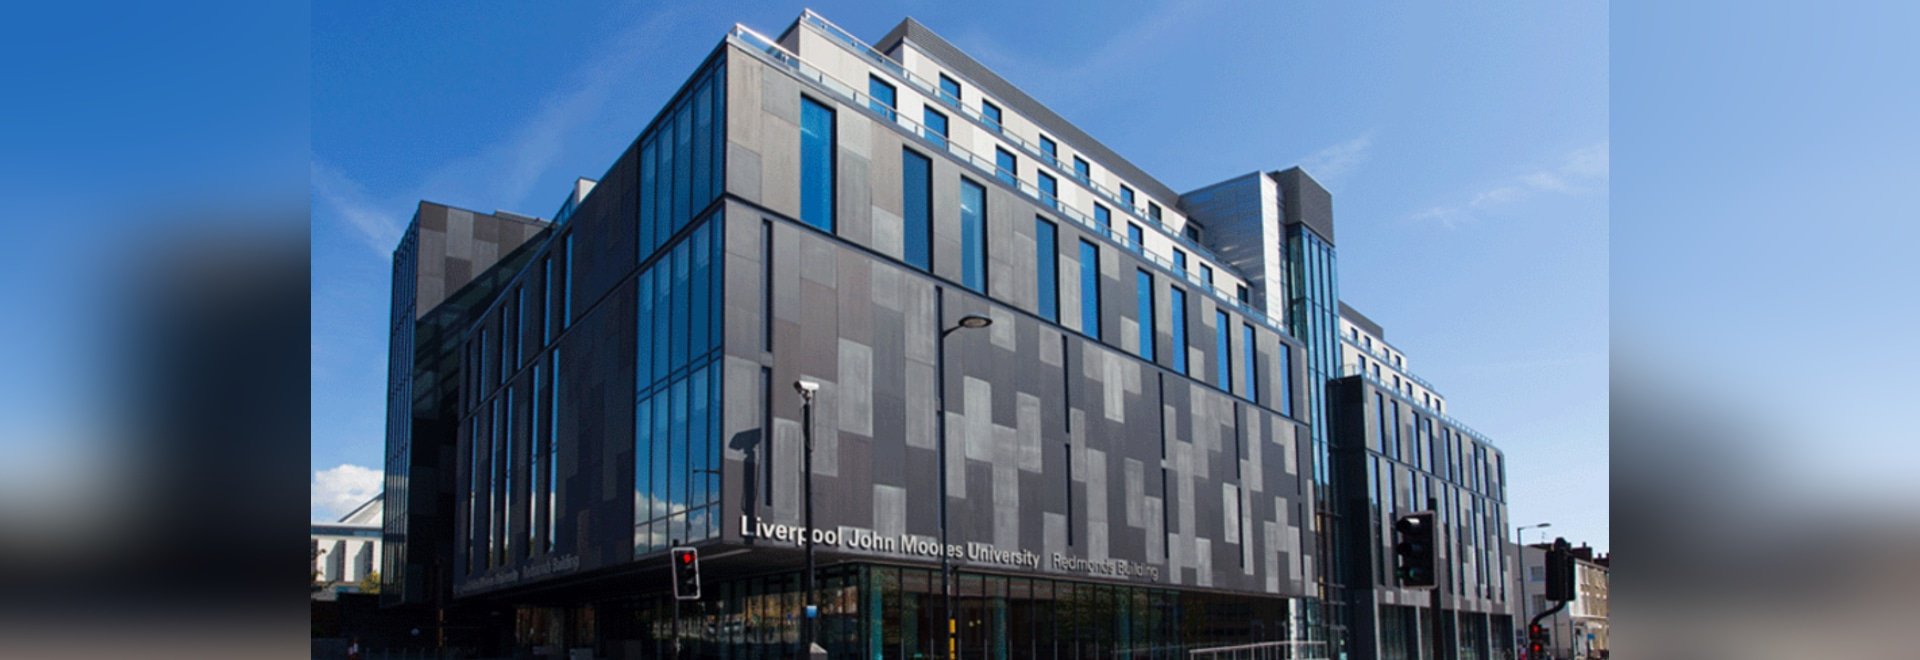 Redmond Building (University of Liverpool)